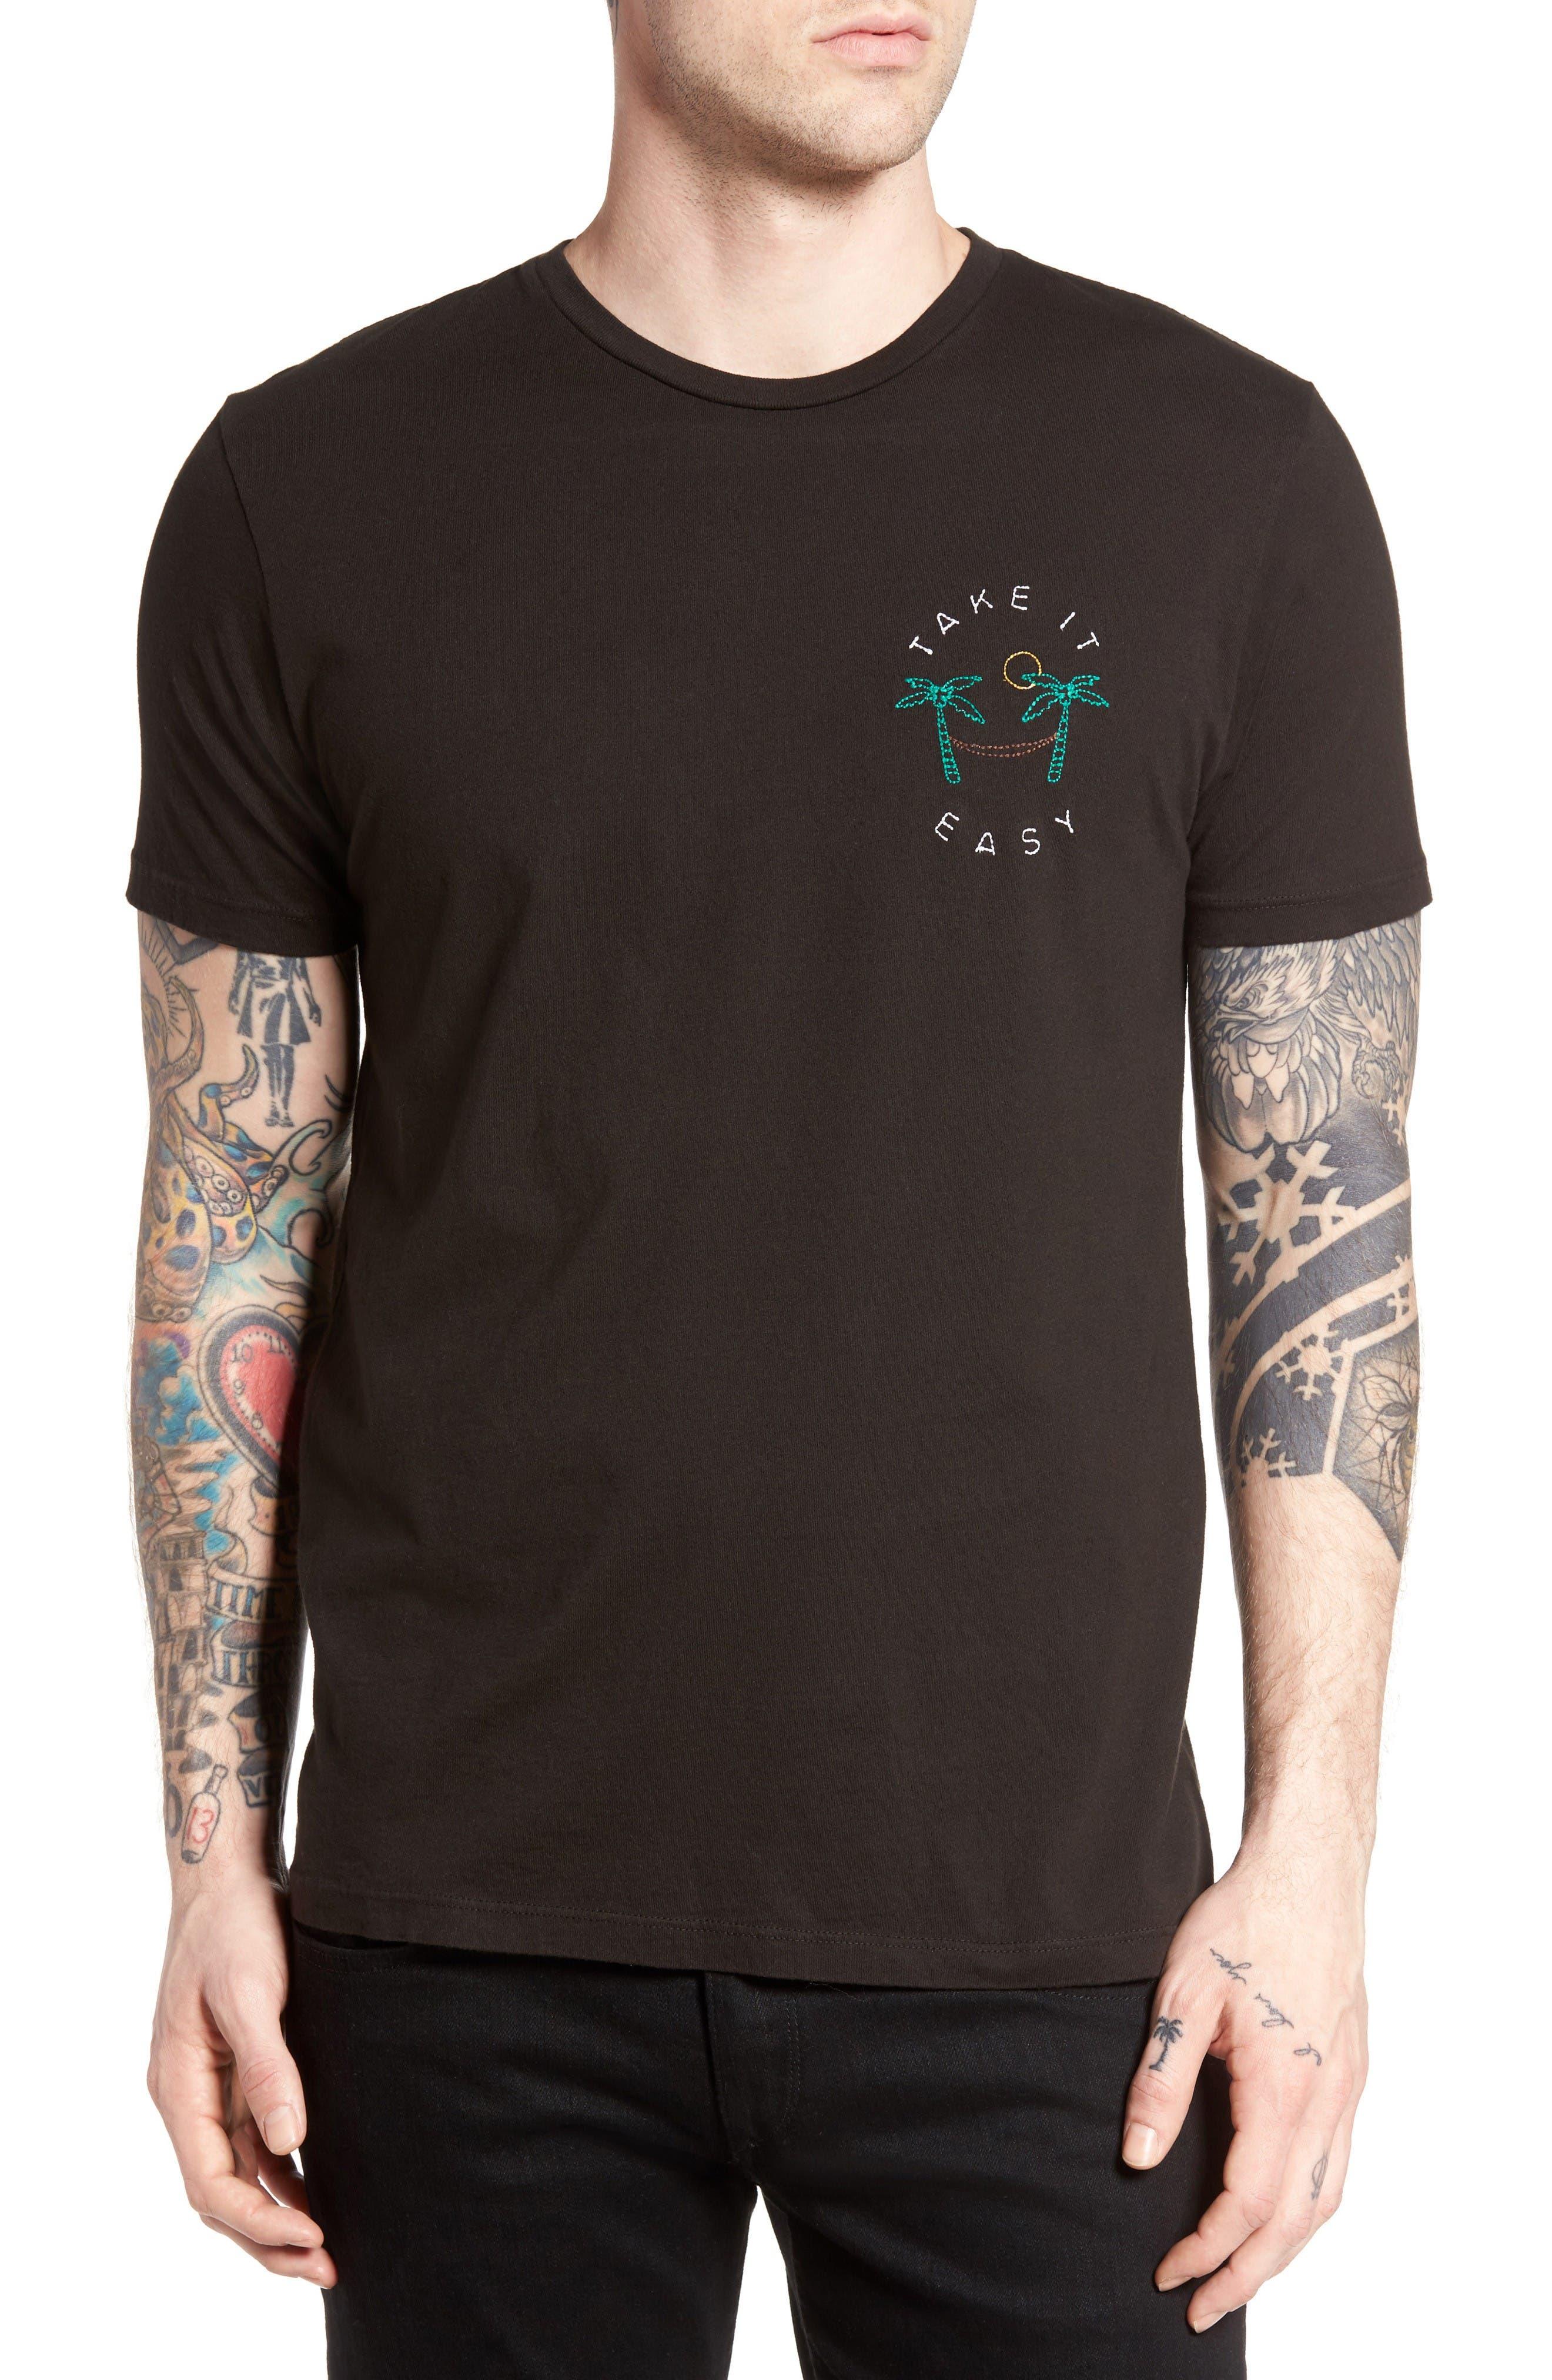 Take It Easy T-Shirt,                         Main,                         color, Graphite